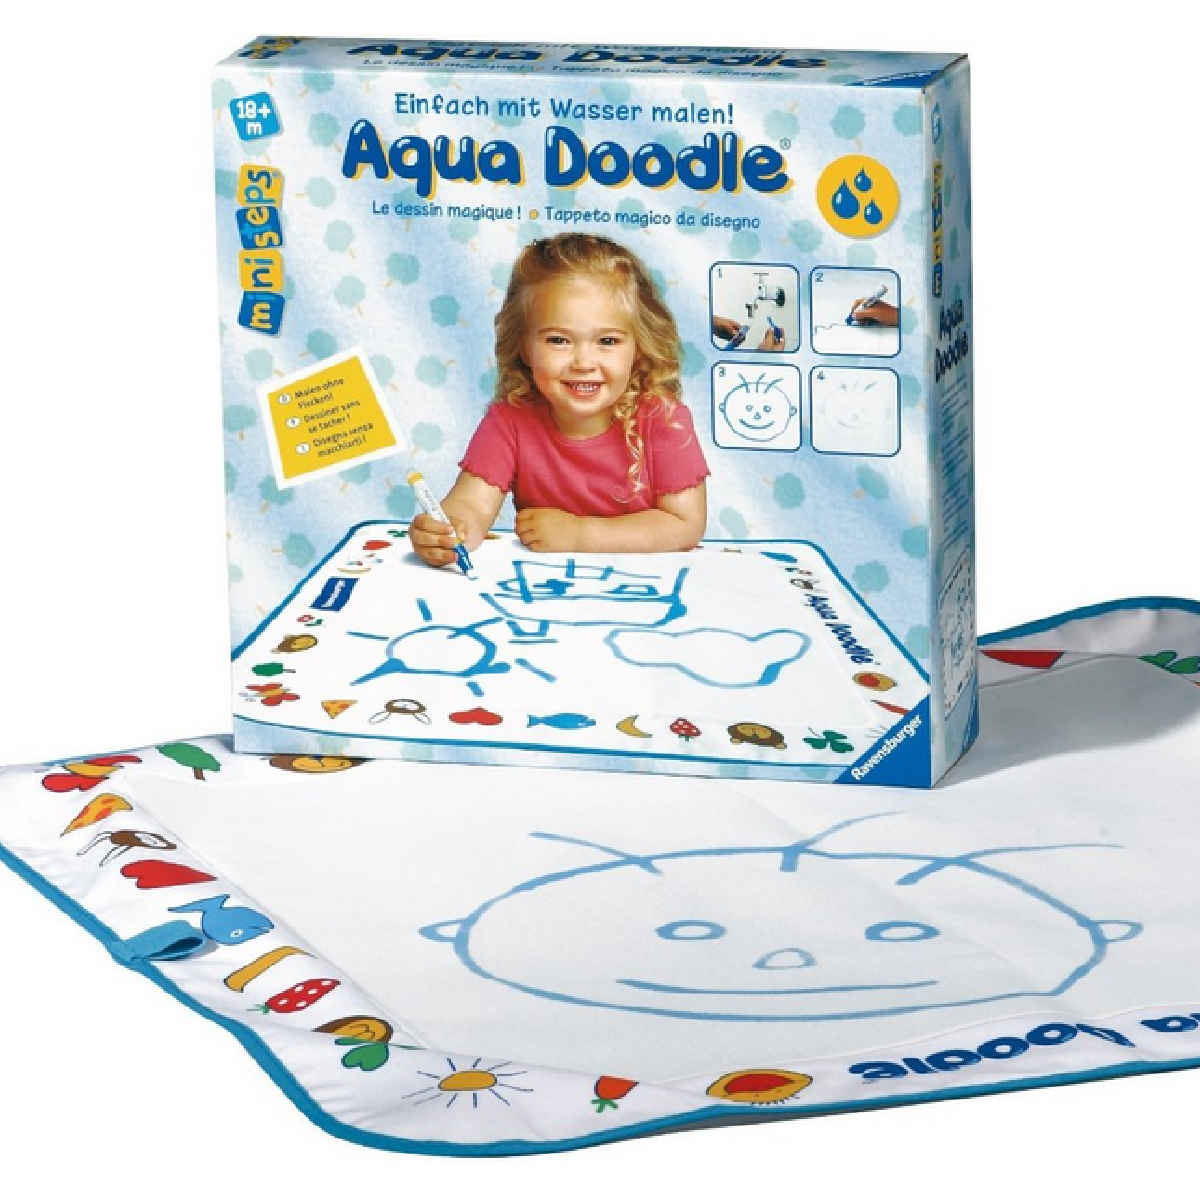 Cadeaux 2 Ouf Idees De Cadeaux Insolites Et Originaux Aqua